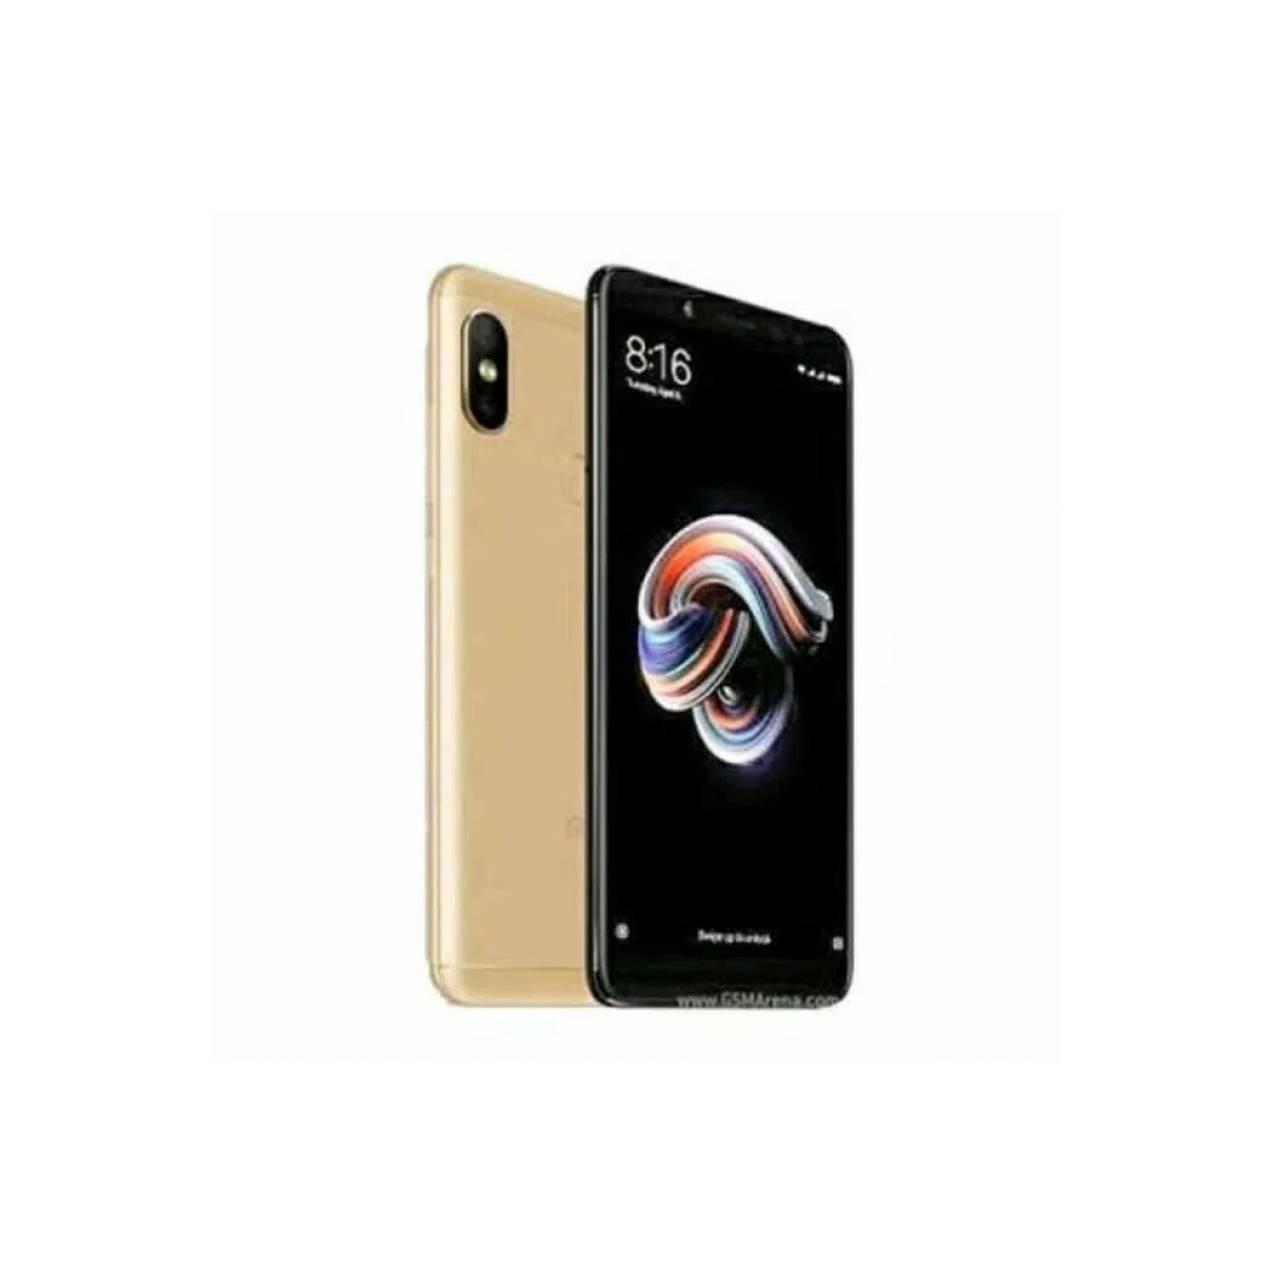 Hp Xiaomi NOTE 5 PRO (xiomi mi note 5 pro) Ram 4/64gb Garansi Resmi - Emas  - 63dec79df51d810d07cffb5d09f8c350 - Update Harga Terbaru Hp Xiaomi Mi5 Gsmarena Agustus 2018